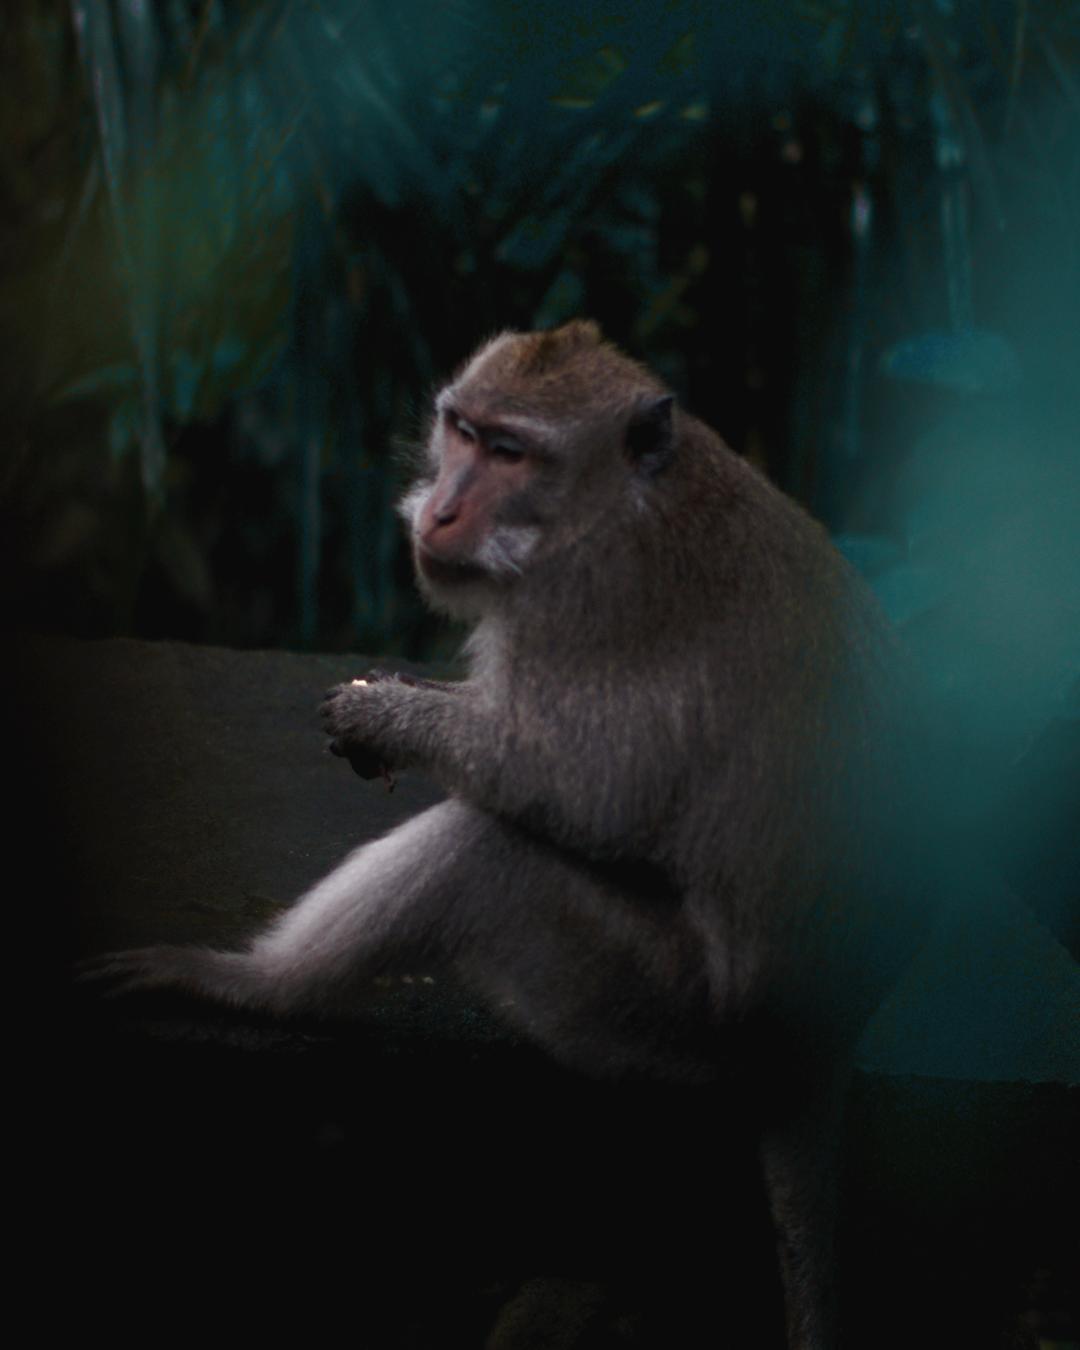 A cheeky monkey at The Monkey Forest. Photo: Jake McCabe.